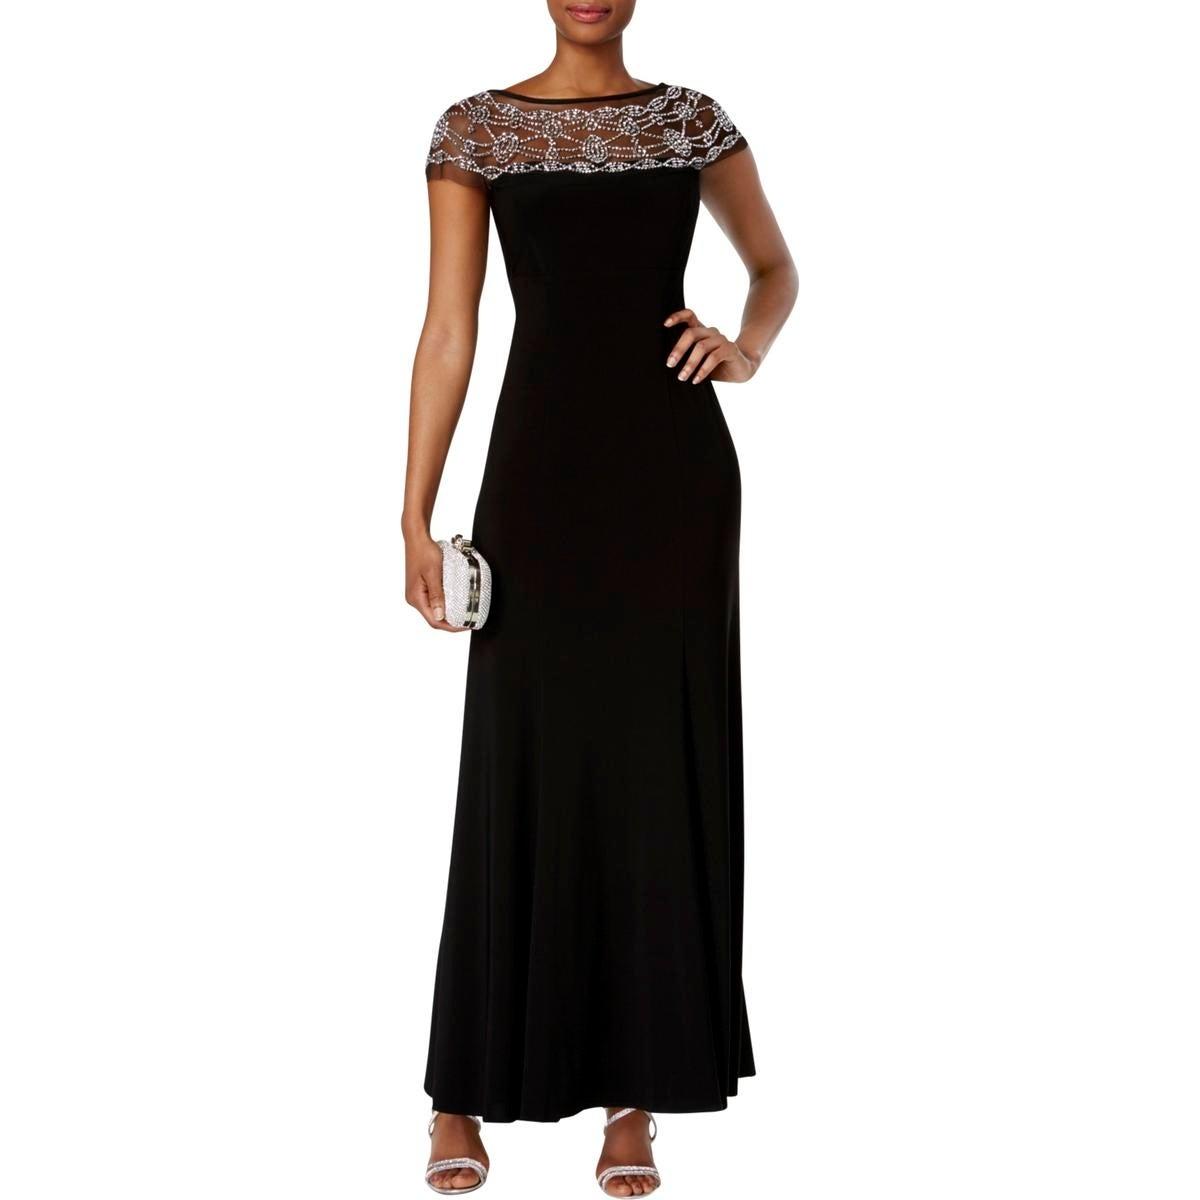 12ac7c94fda0c Womens Evening Dresses - raveitsafe